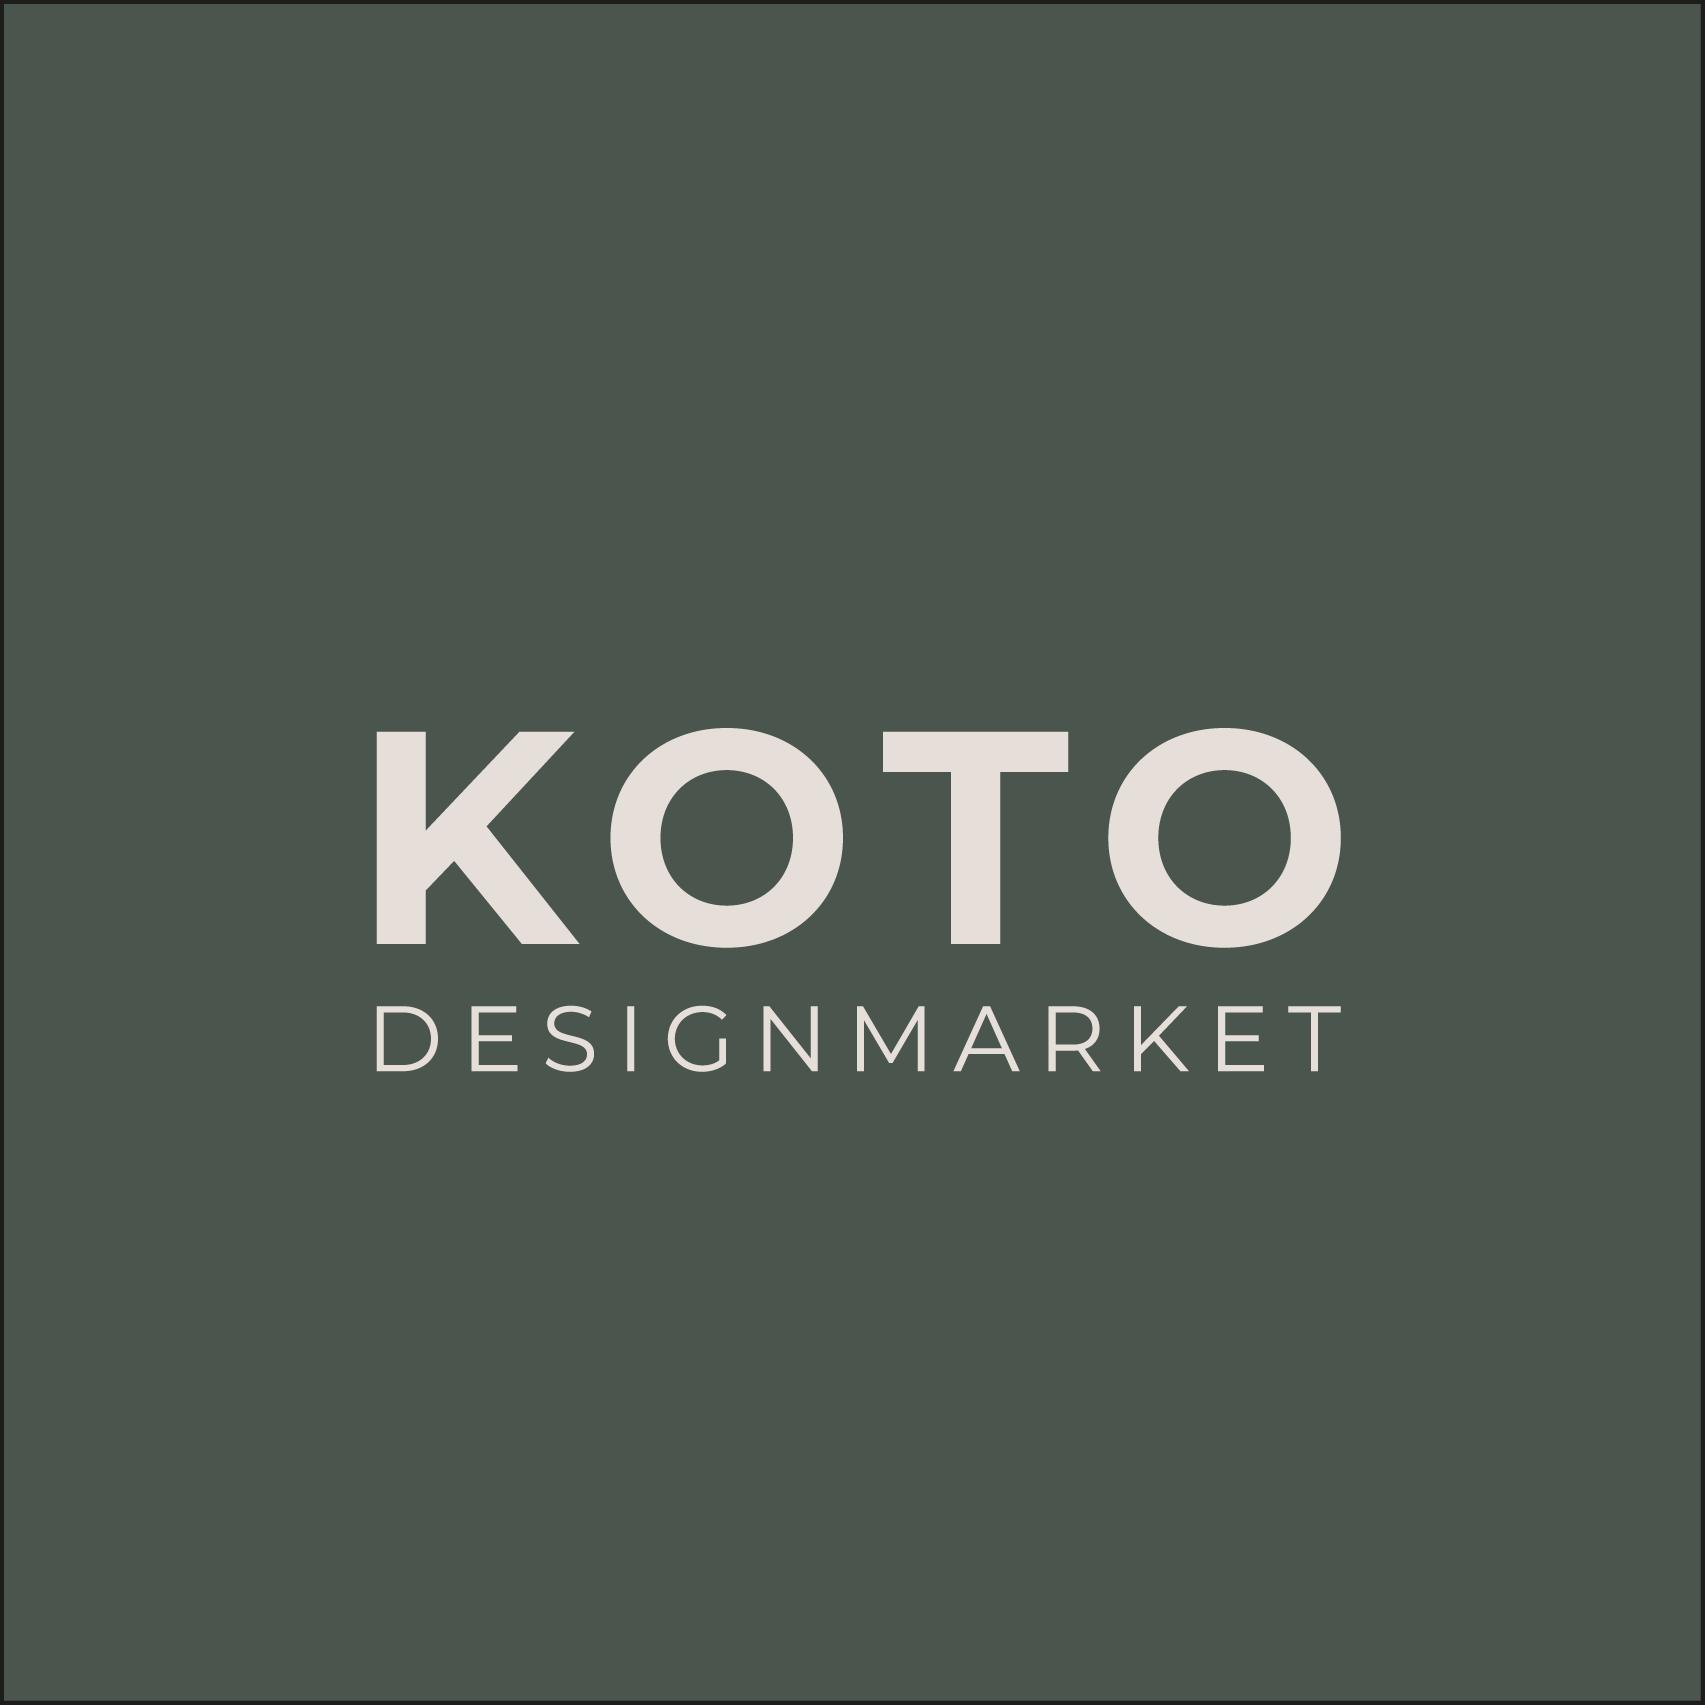 KOTO Design Market logo